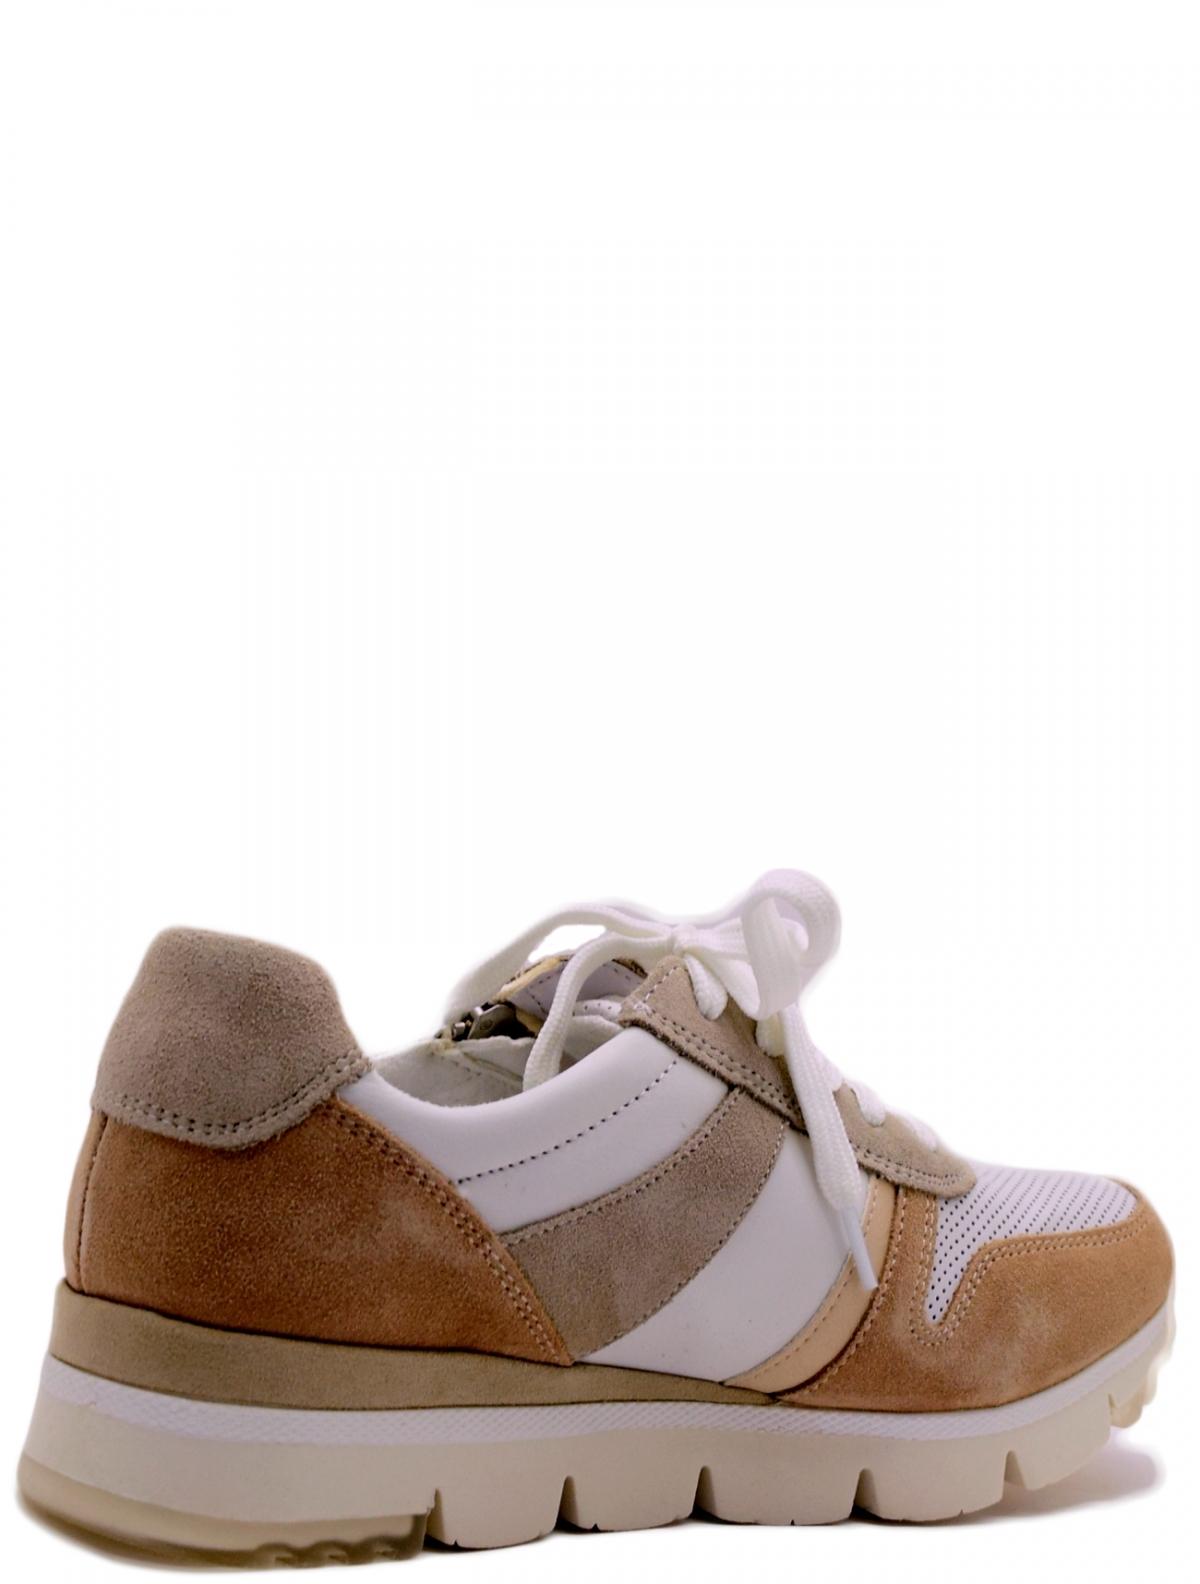 Marco Tozzi 2-23754-26-197 женские кроссовки